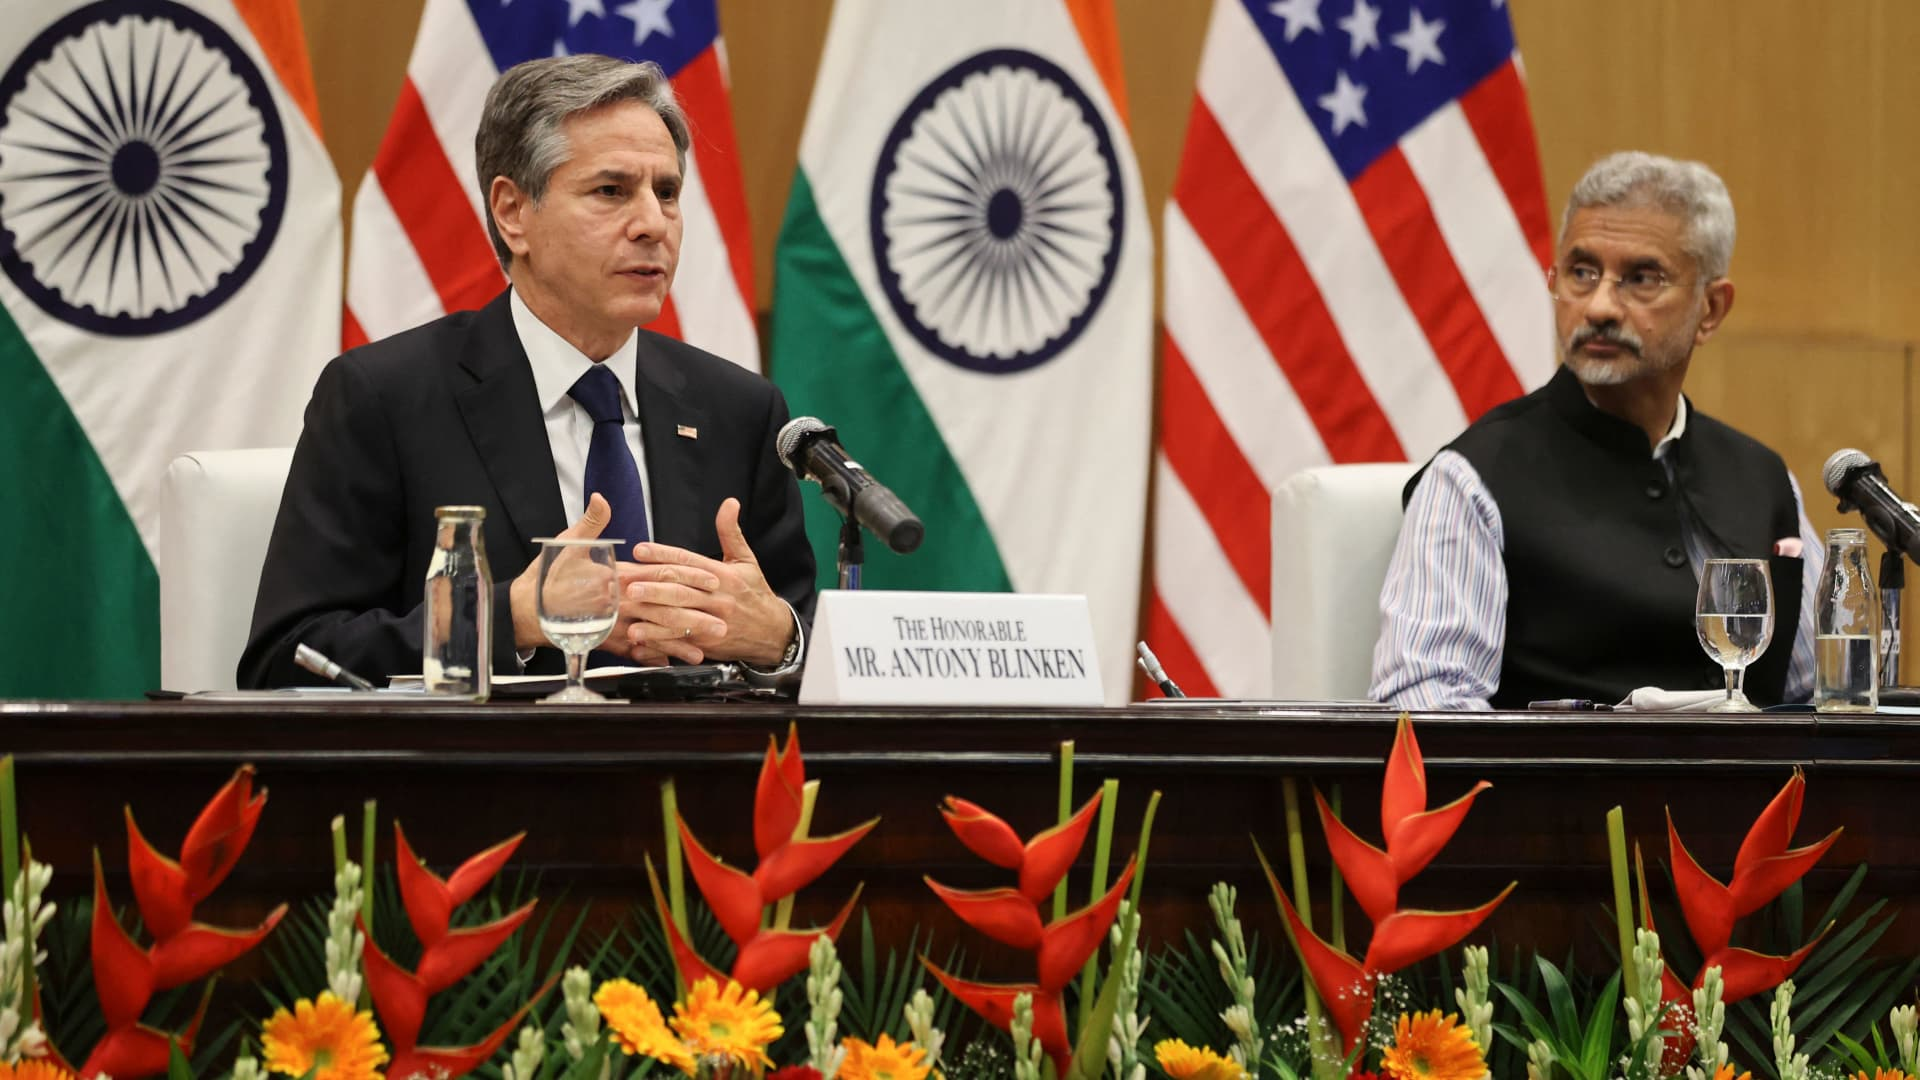 India's Minister of External Affairs Subrahmanyam Jaishankar (R) and U.S. Secretary of State Antony Blinken hold a joint news conference at Jawaharlal Nehru Bhawan in New Delhi on July 28, 2021.